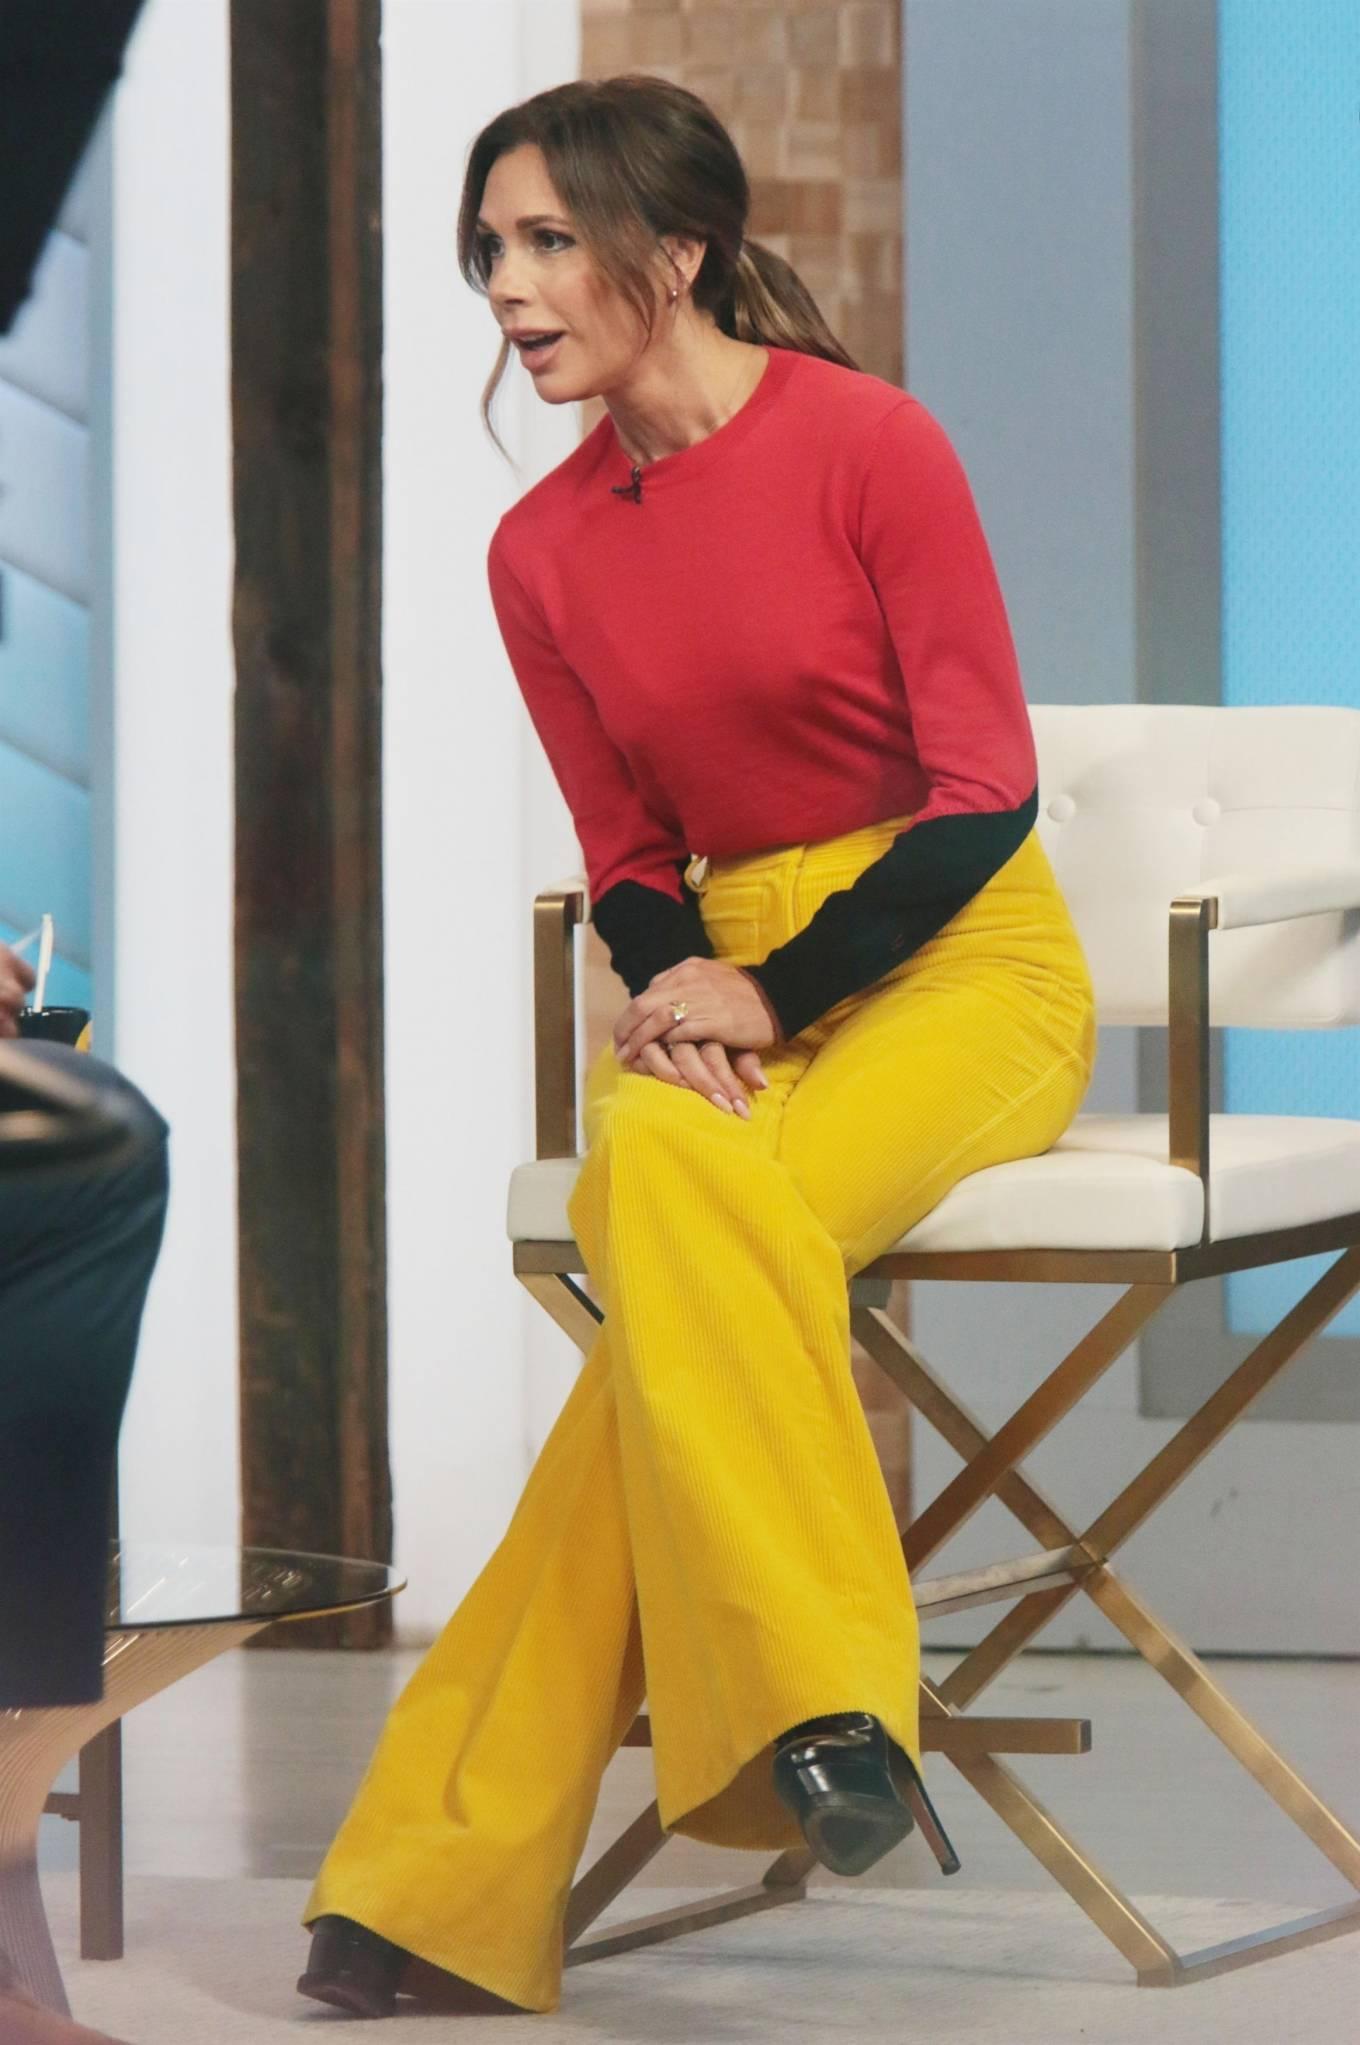 Victoria Beckham 2021 : Victoria Beckham – on Good Morning America promoting her new designer clothing in New York City-37